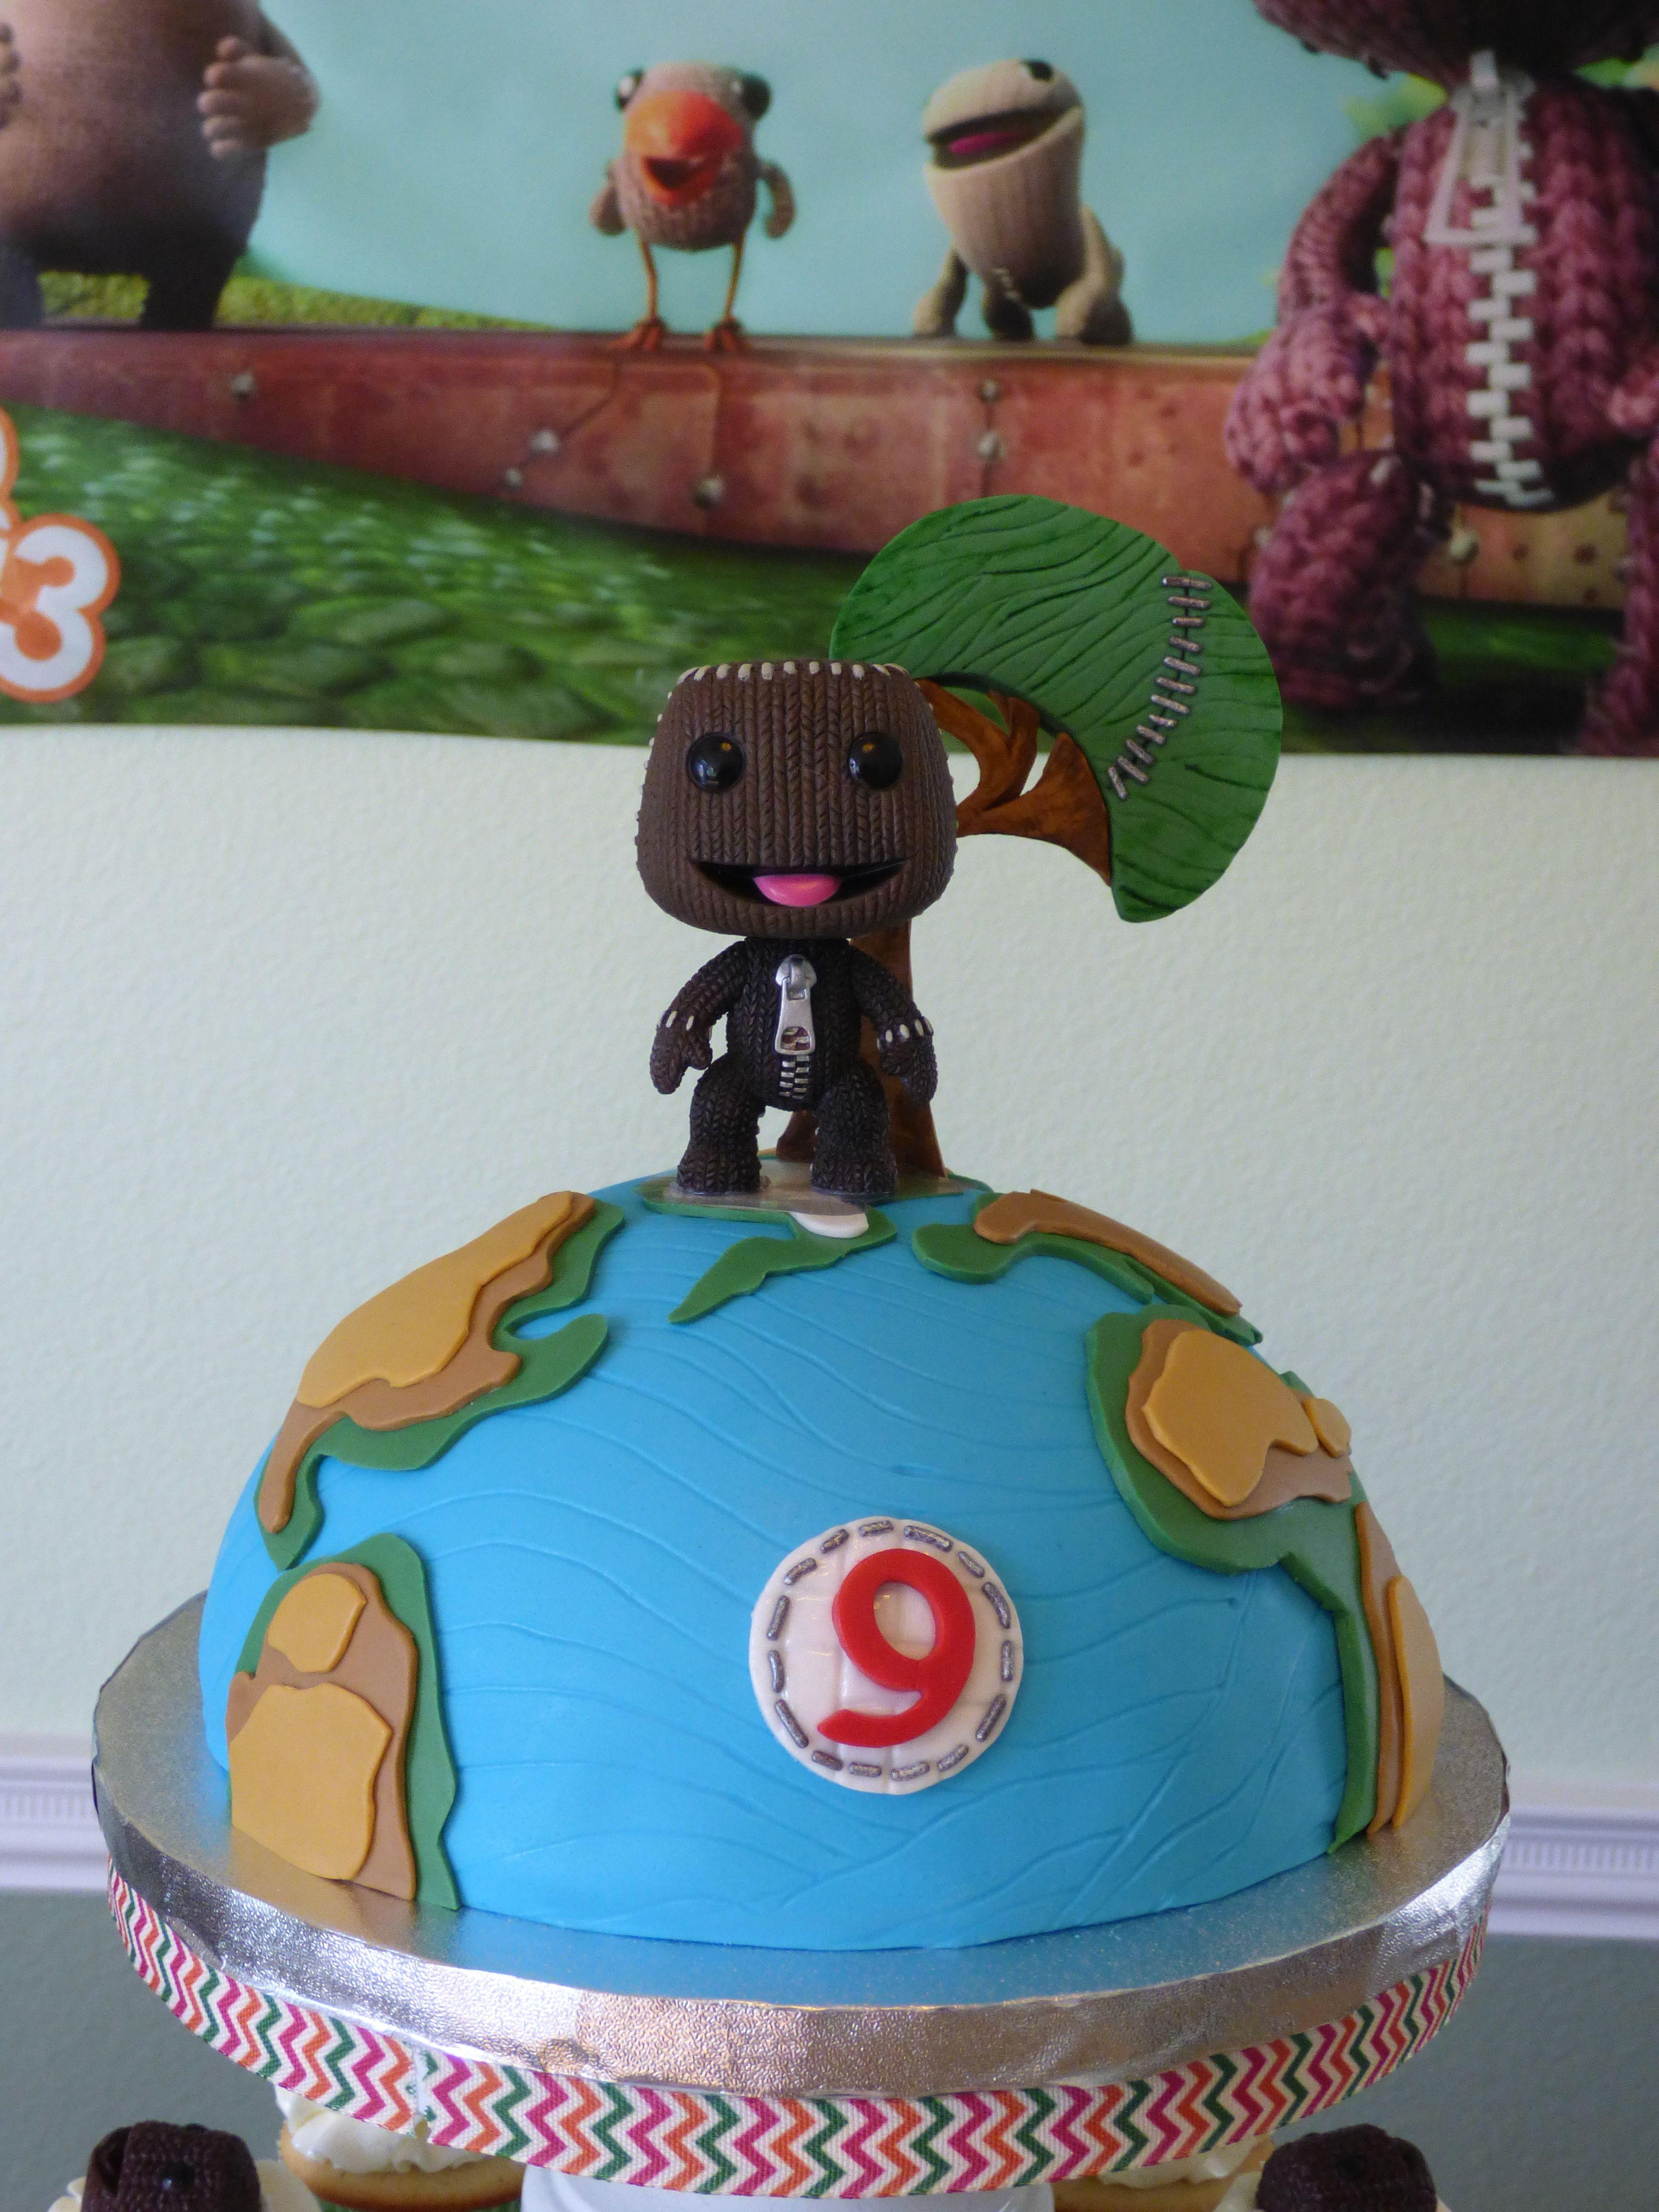 Miraculous Little Big Planet Theme Birthday Cake Chocolate Cake With Sackboy Birthday Cards Printable Riciscafe Filternl